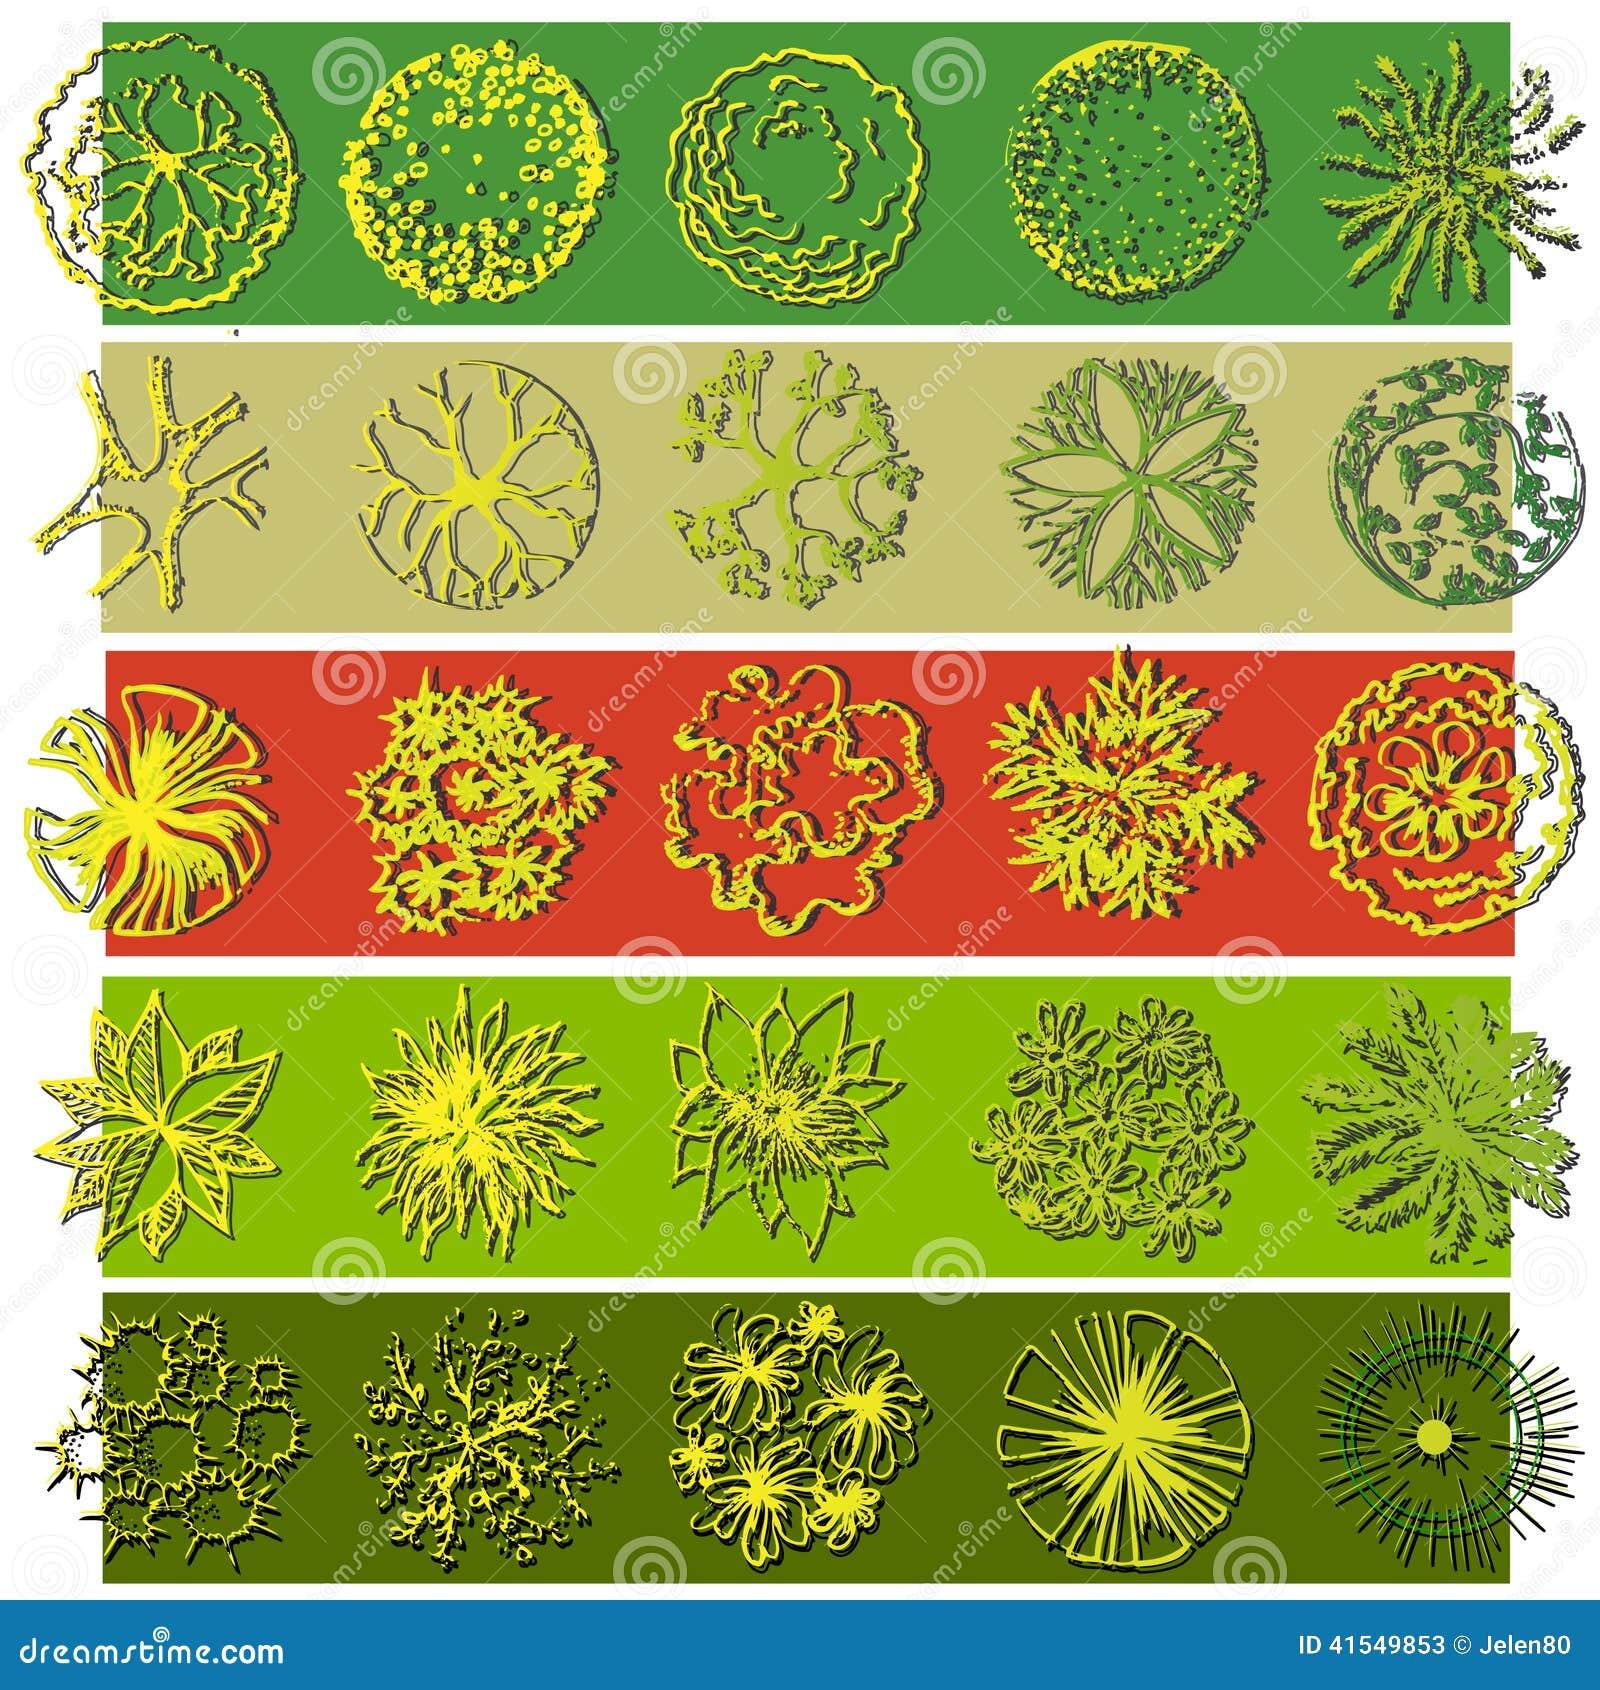 A Set Of Treetop Symbols For Landscape Design Stock Vector - Image ...